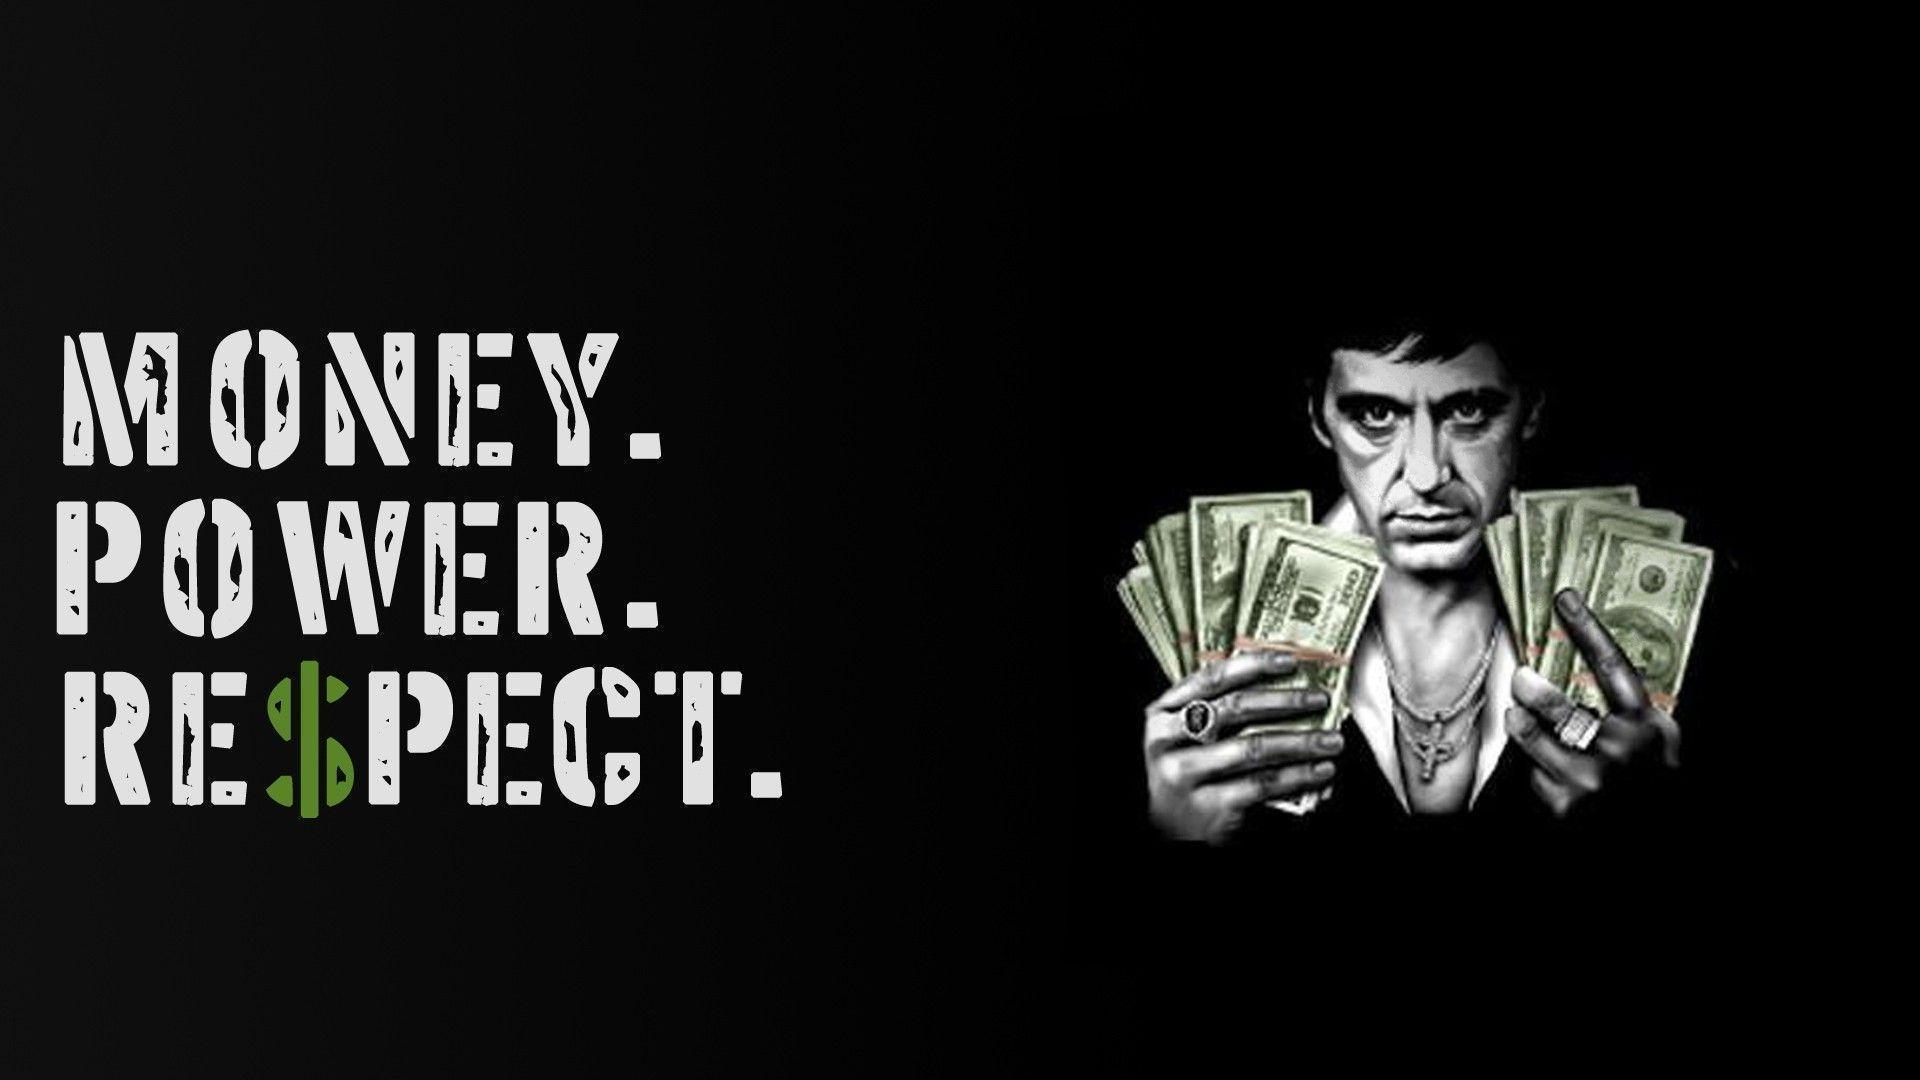 Download Wallpaper Logo Gangster - wp1915428  Trends_662391.jpg